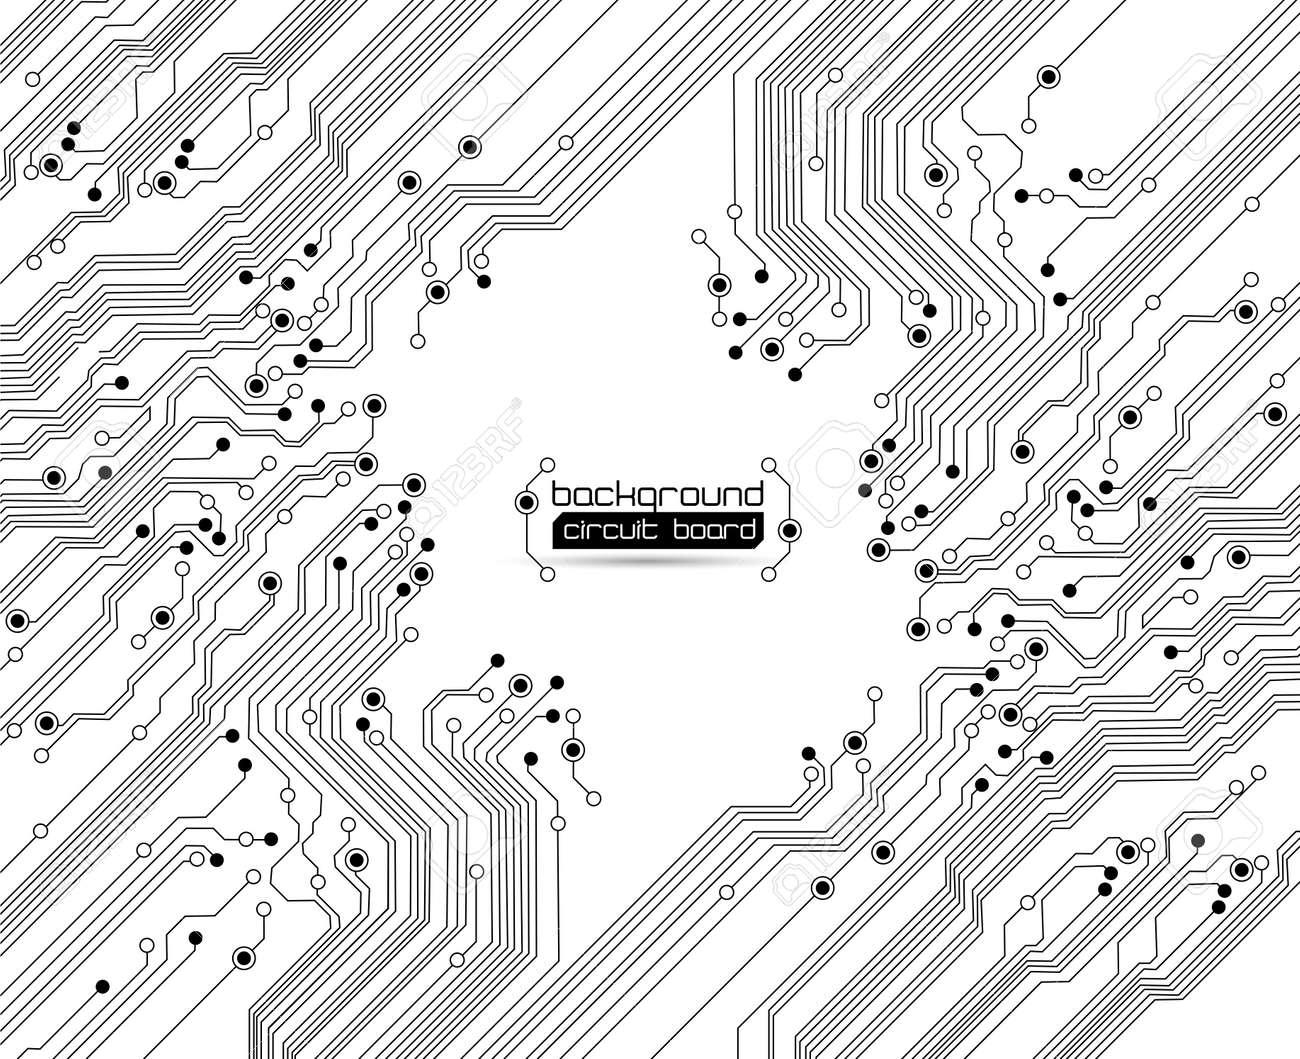 circuit board background texture Stock Vector - 10375246